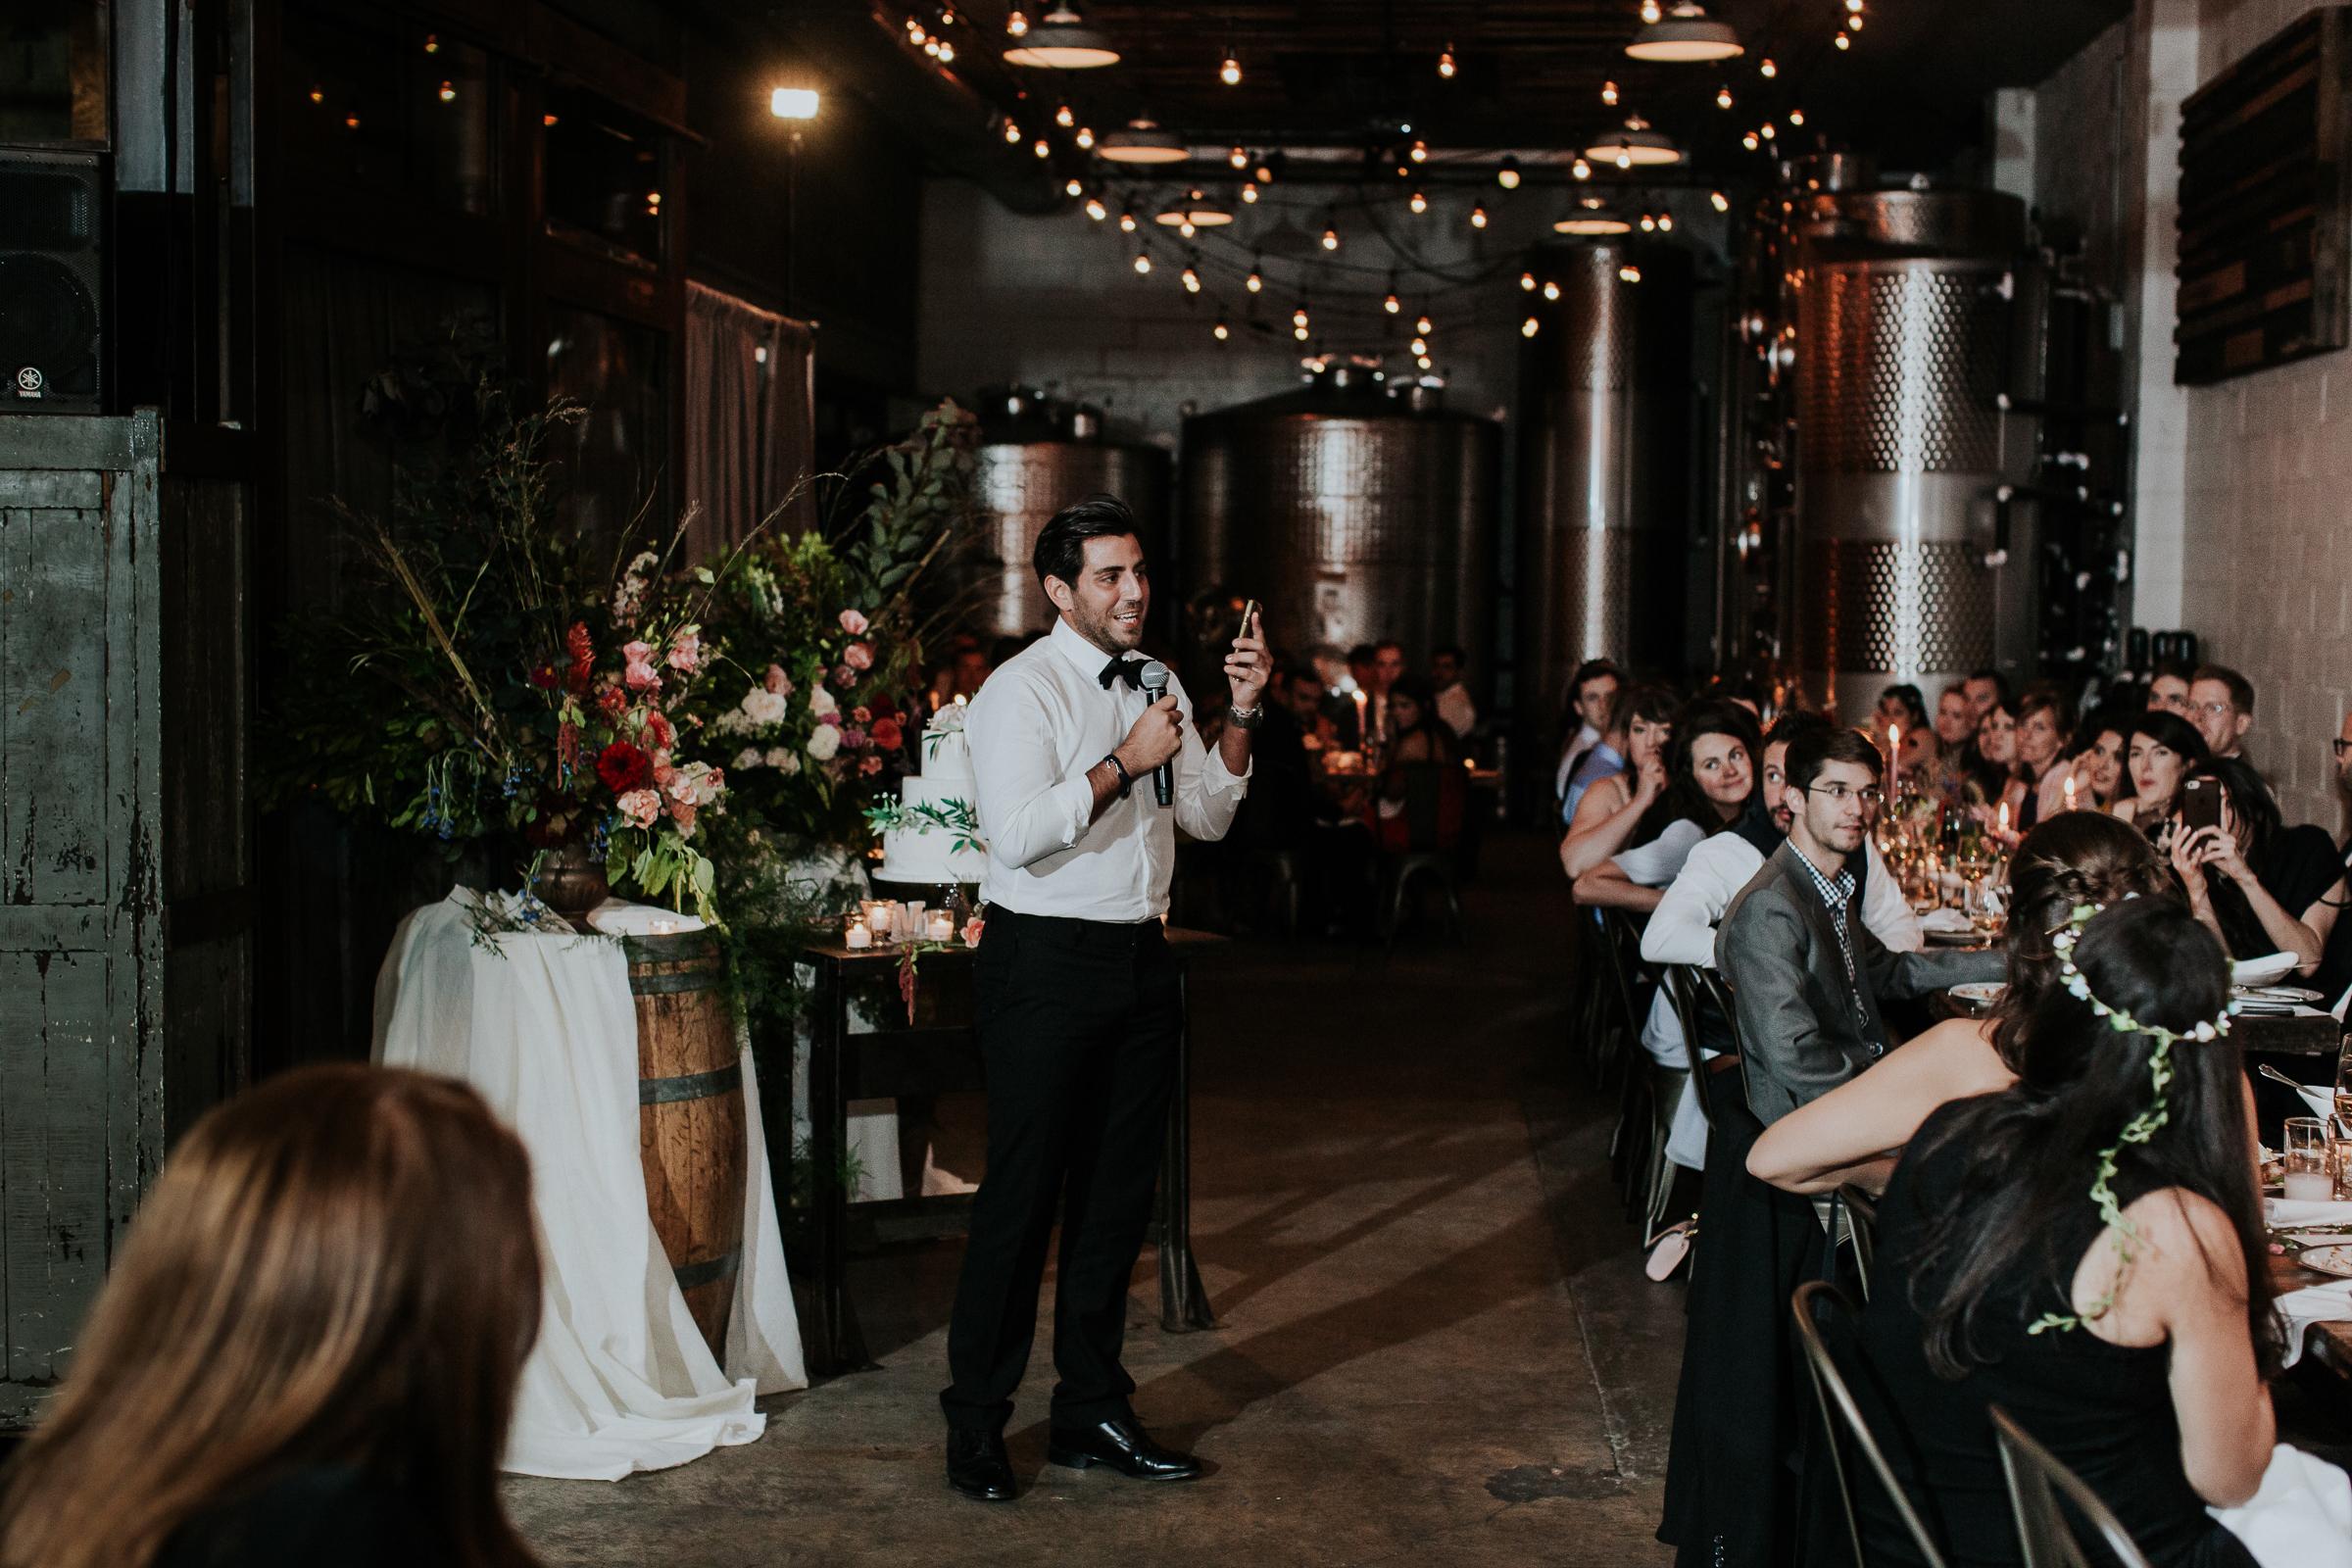 Brooklyn-Winery-NYC-Editorial-Documentary-Wedding-Photographer-Gina-Oli-94.jpg